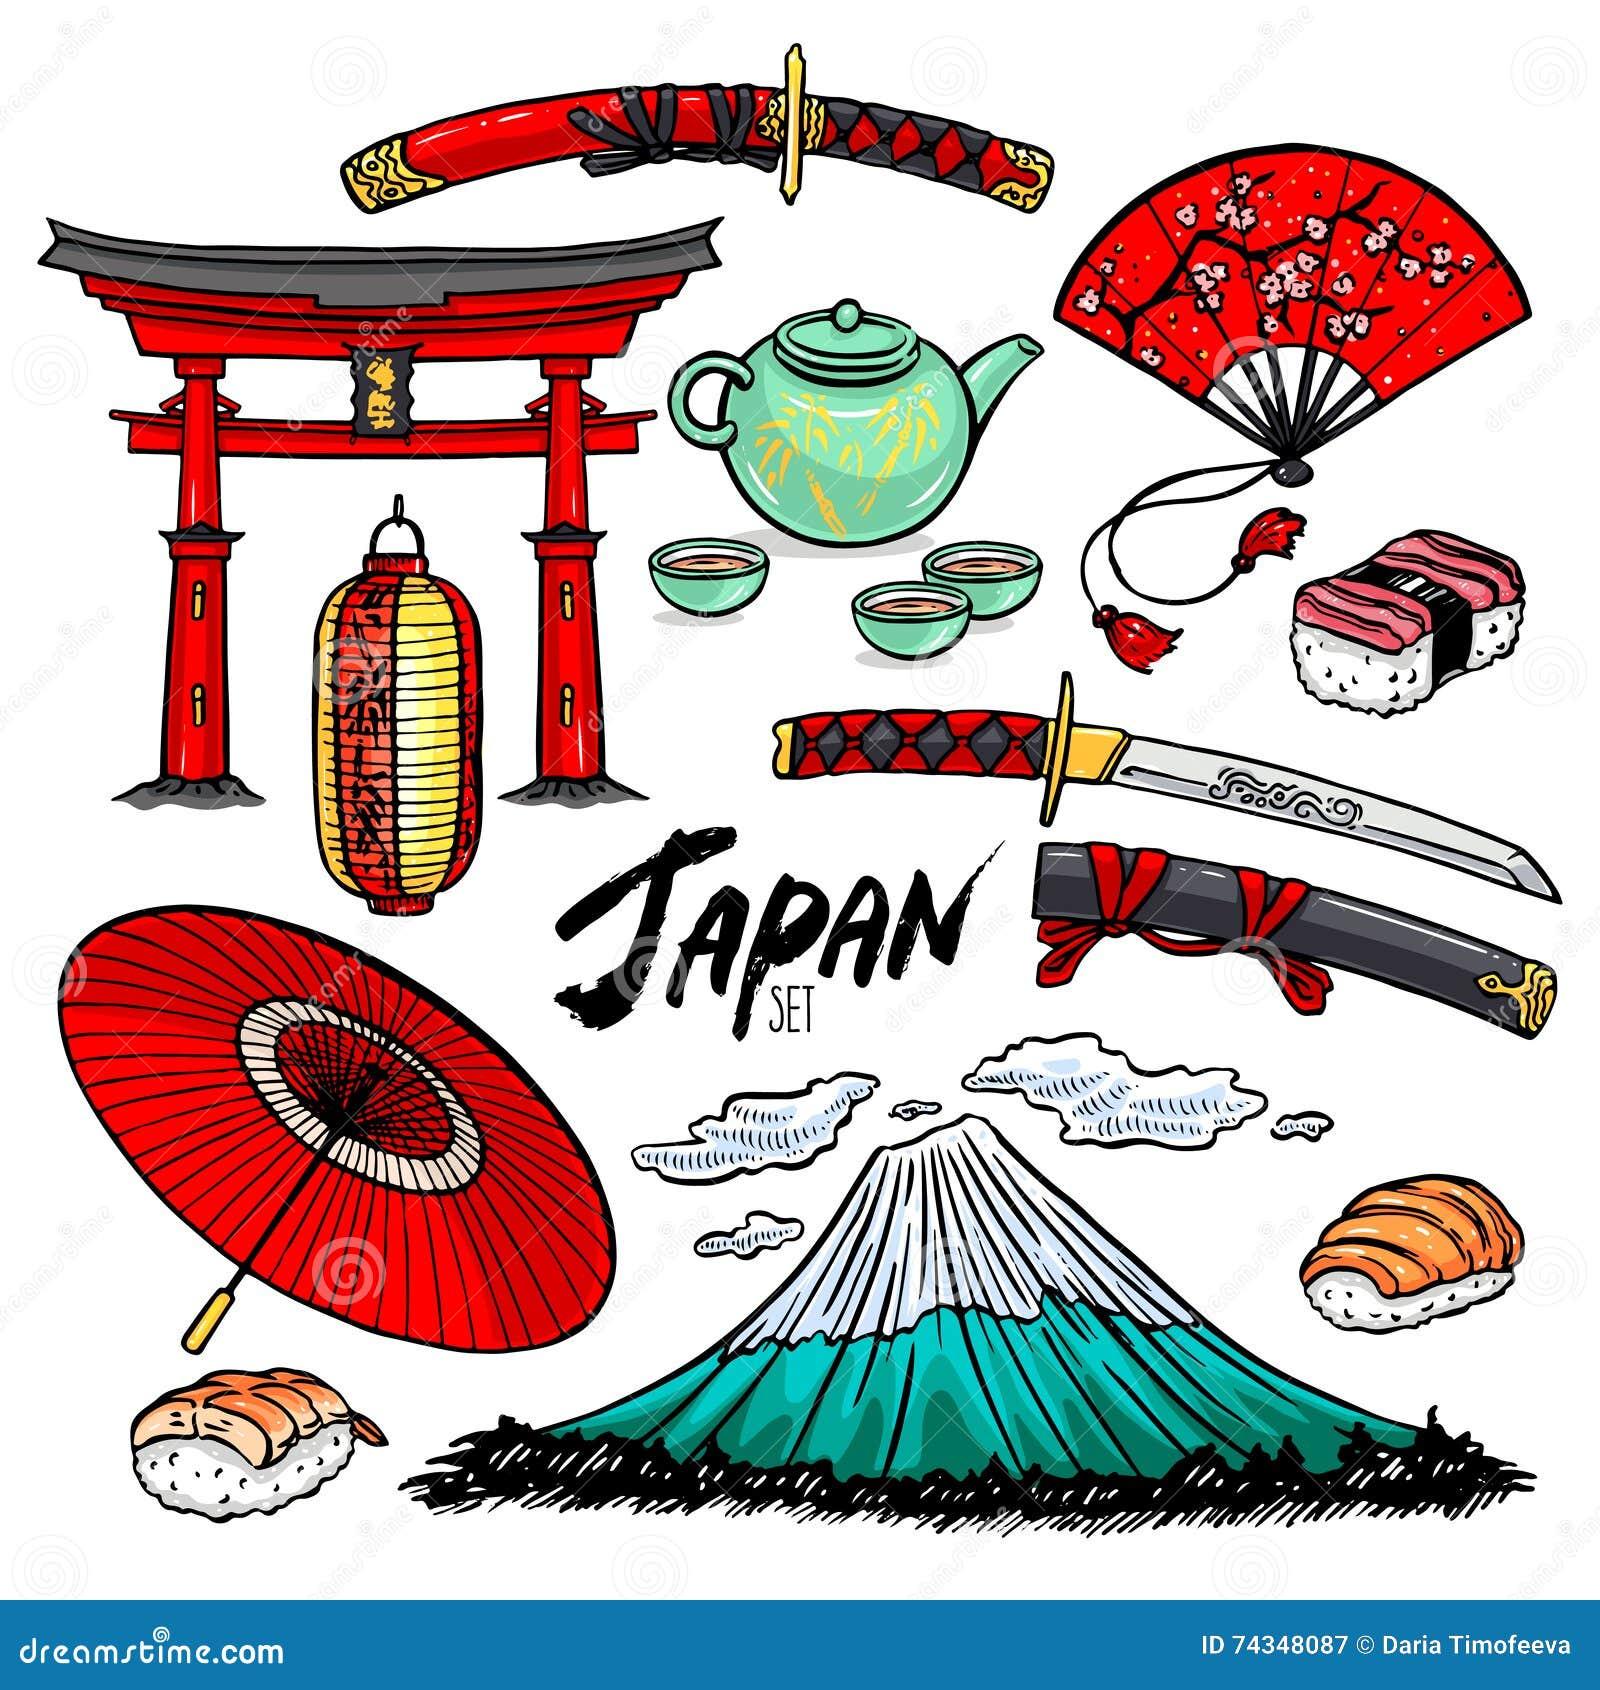 japanese com: